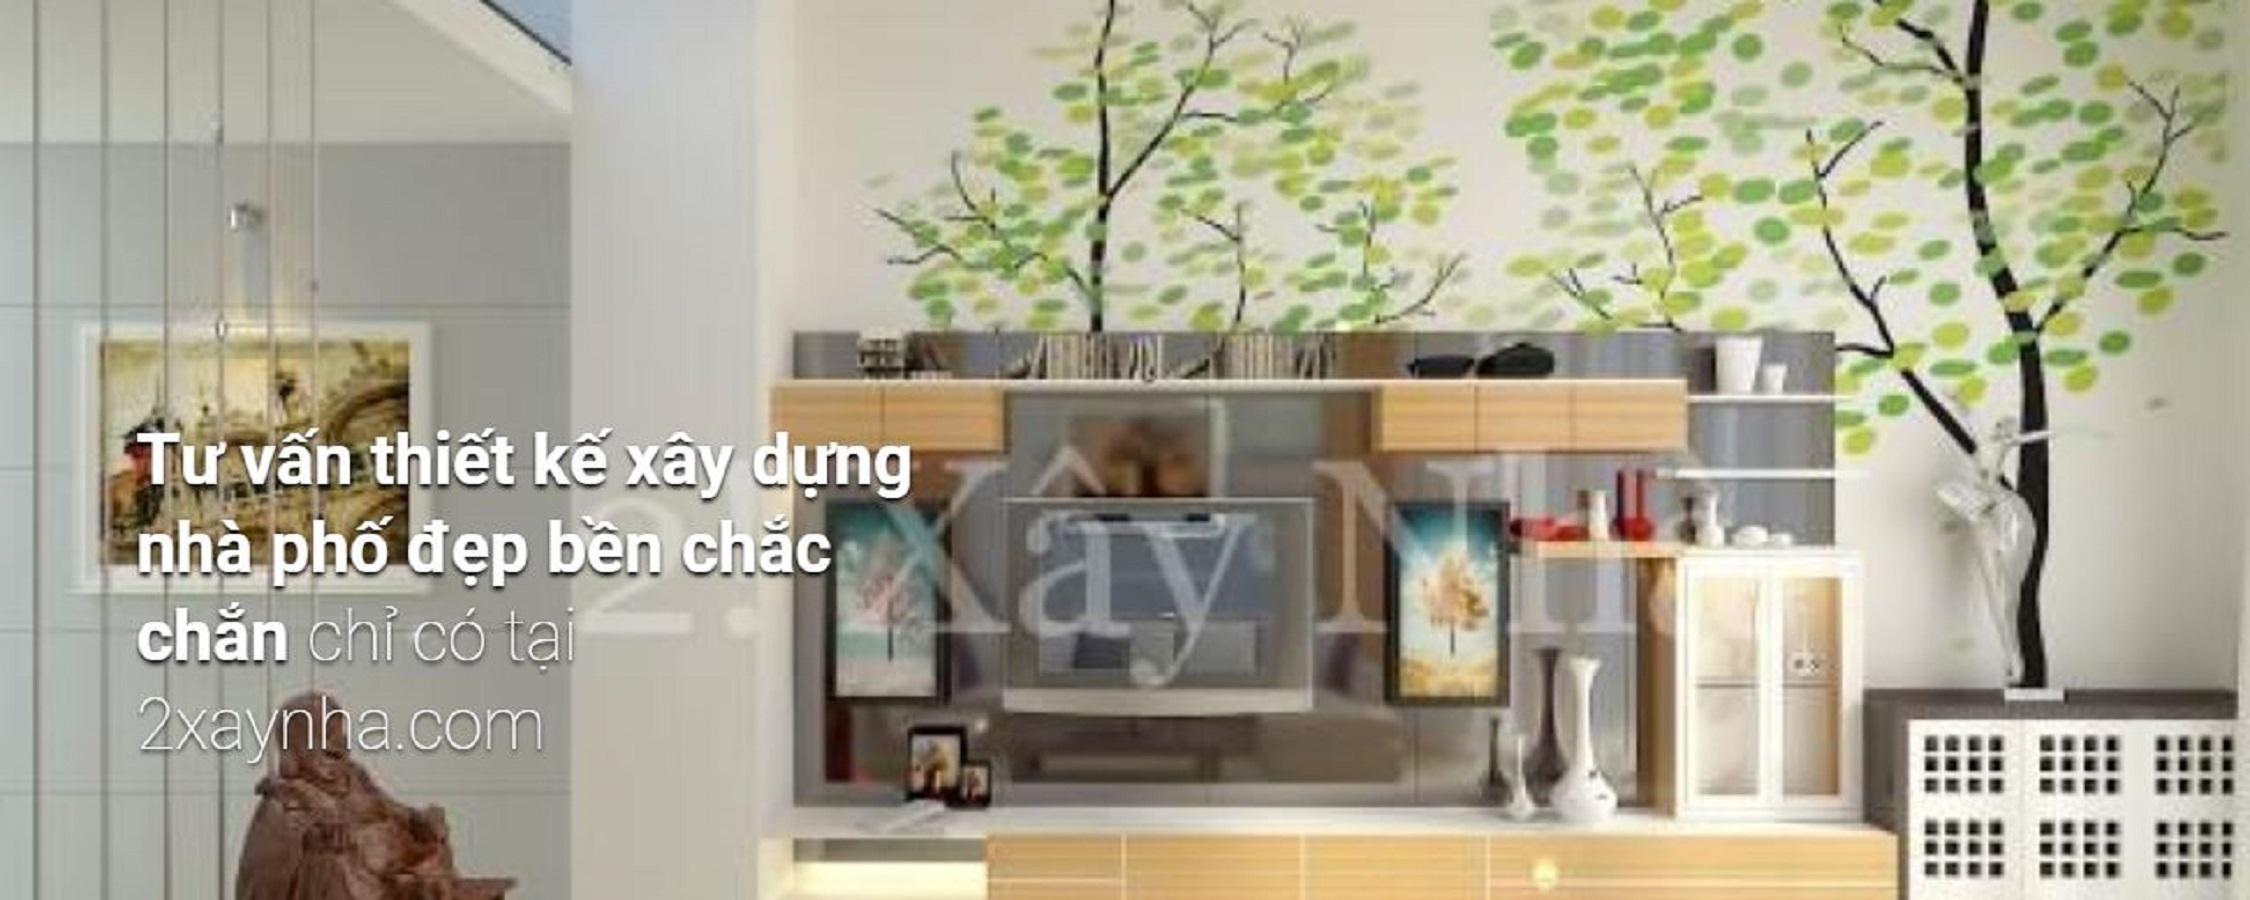 2 Xay nha Co., Ltd (@2xaynhacom) Cover Image